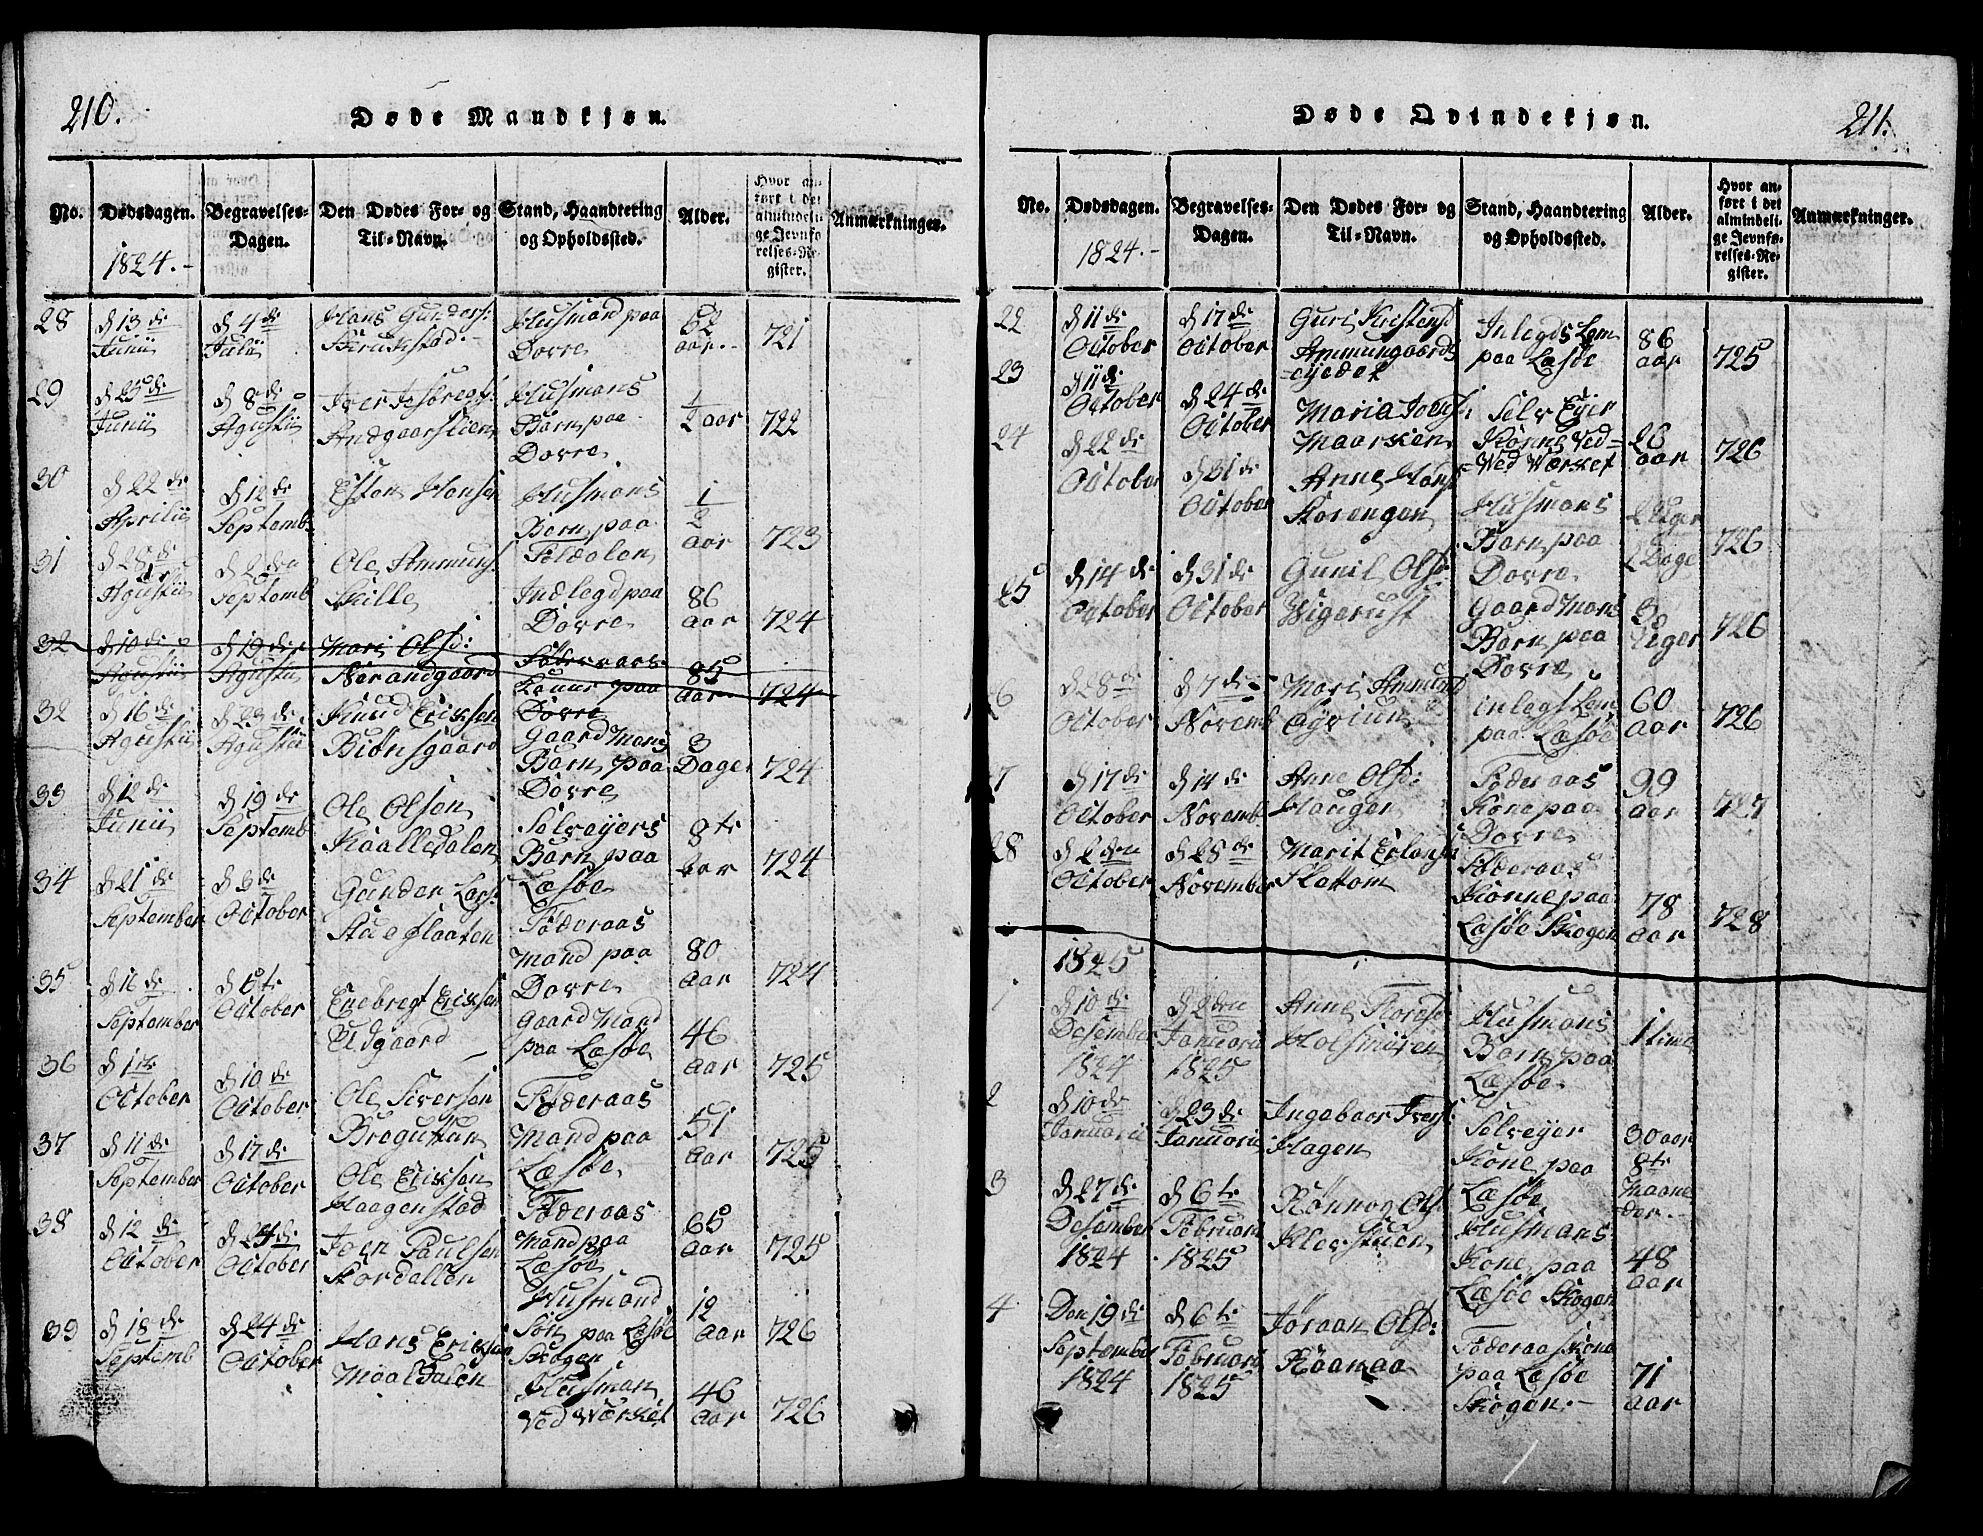 SAH, Lesja prestekontor, Klokkerbok nr. 1, 1820-1831, s. 210-211